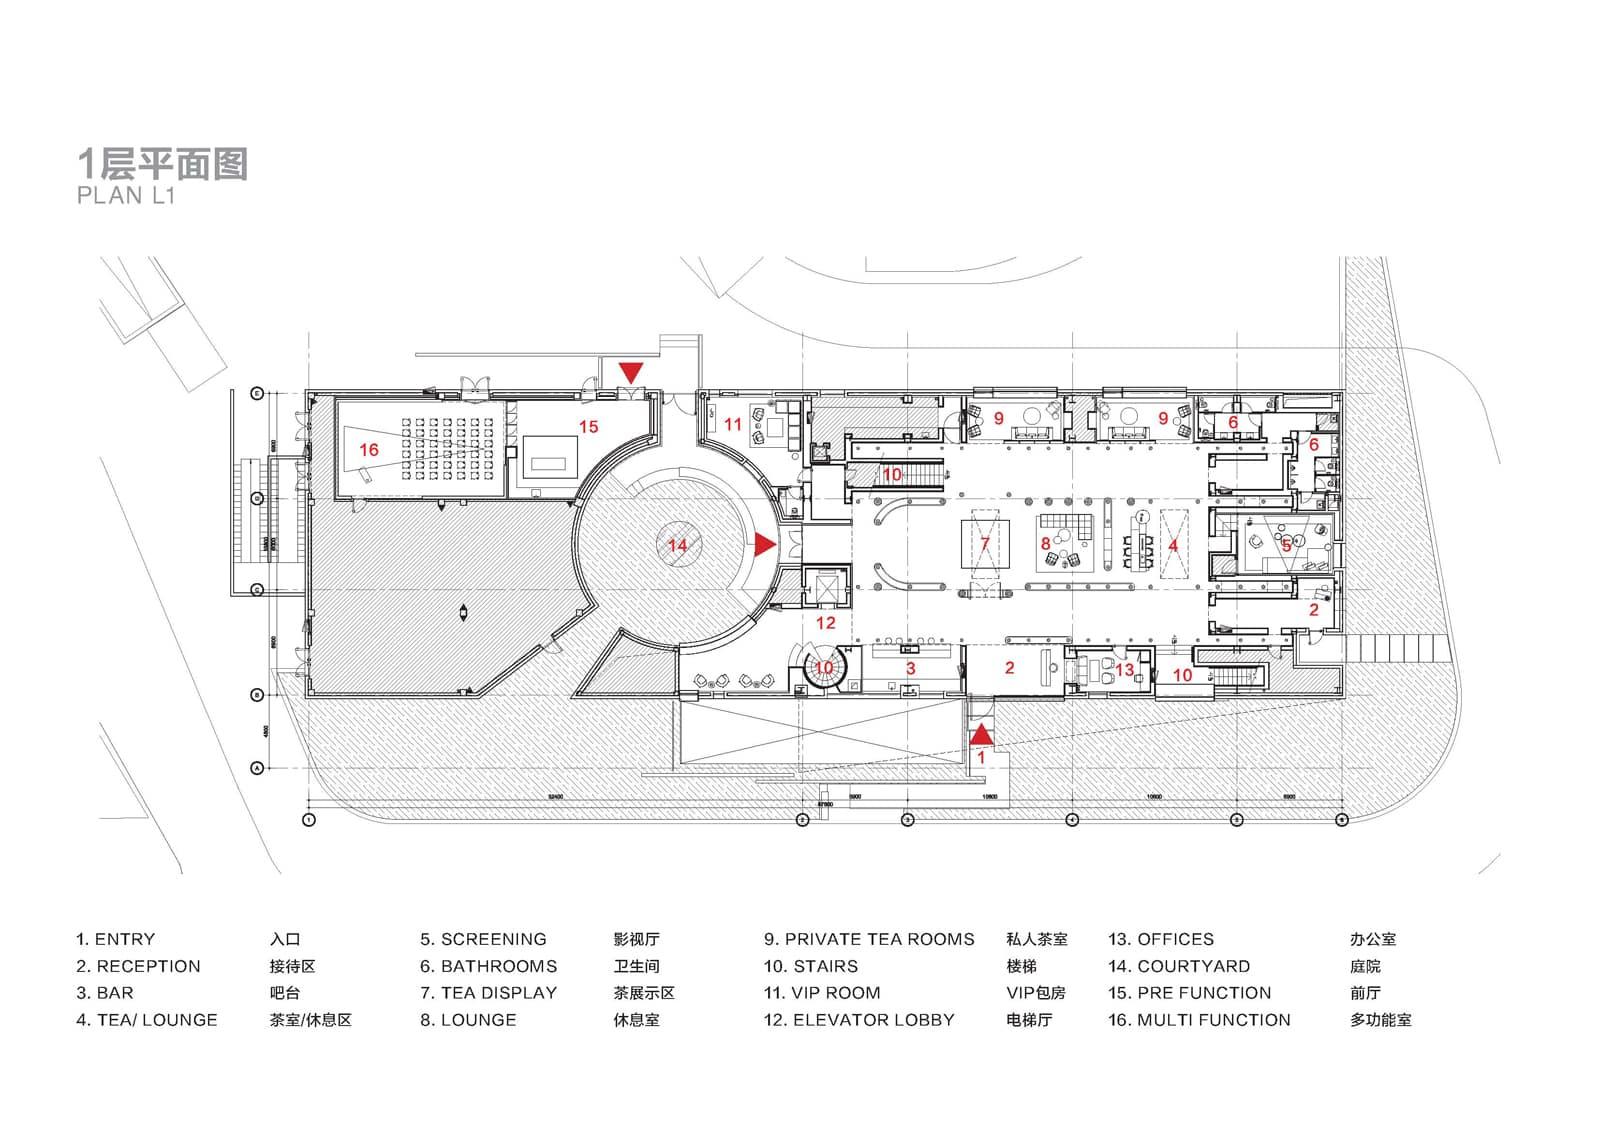 Fuzhou Teahouse  - 20210809 NeriHu FuzhouTeahouse 09.2.2 56